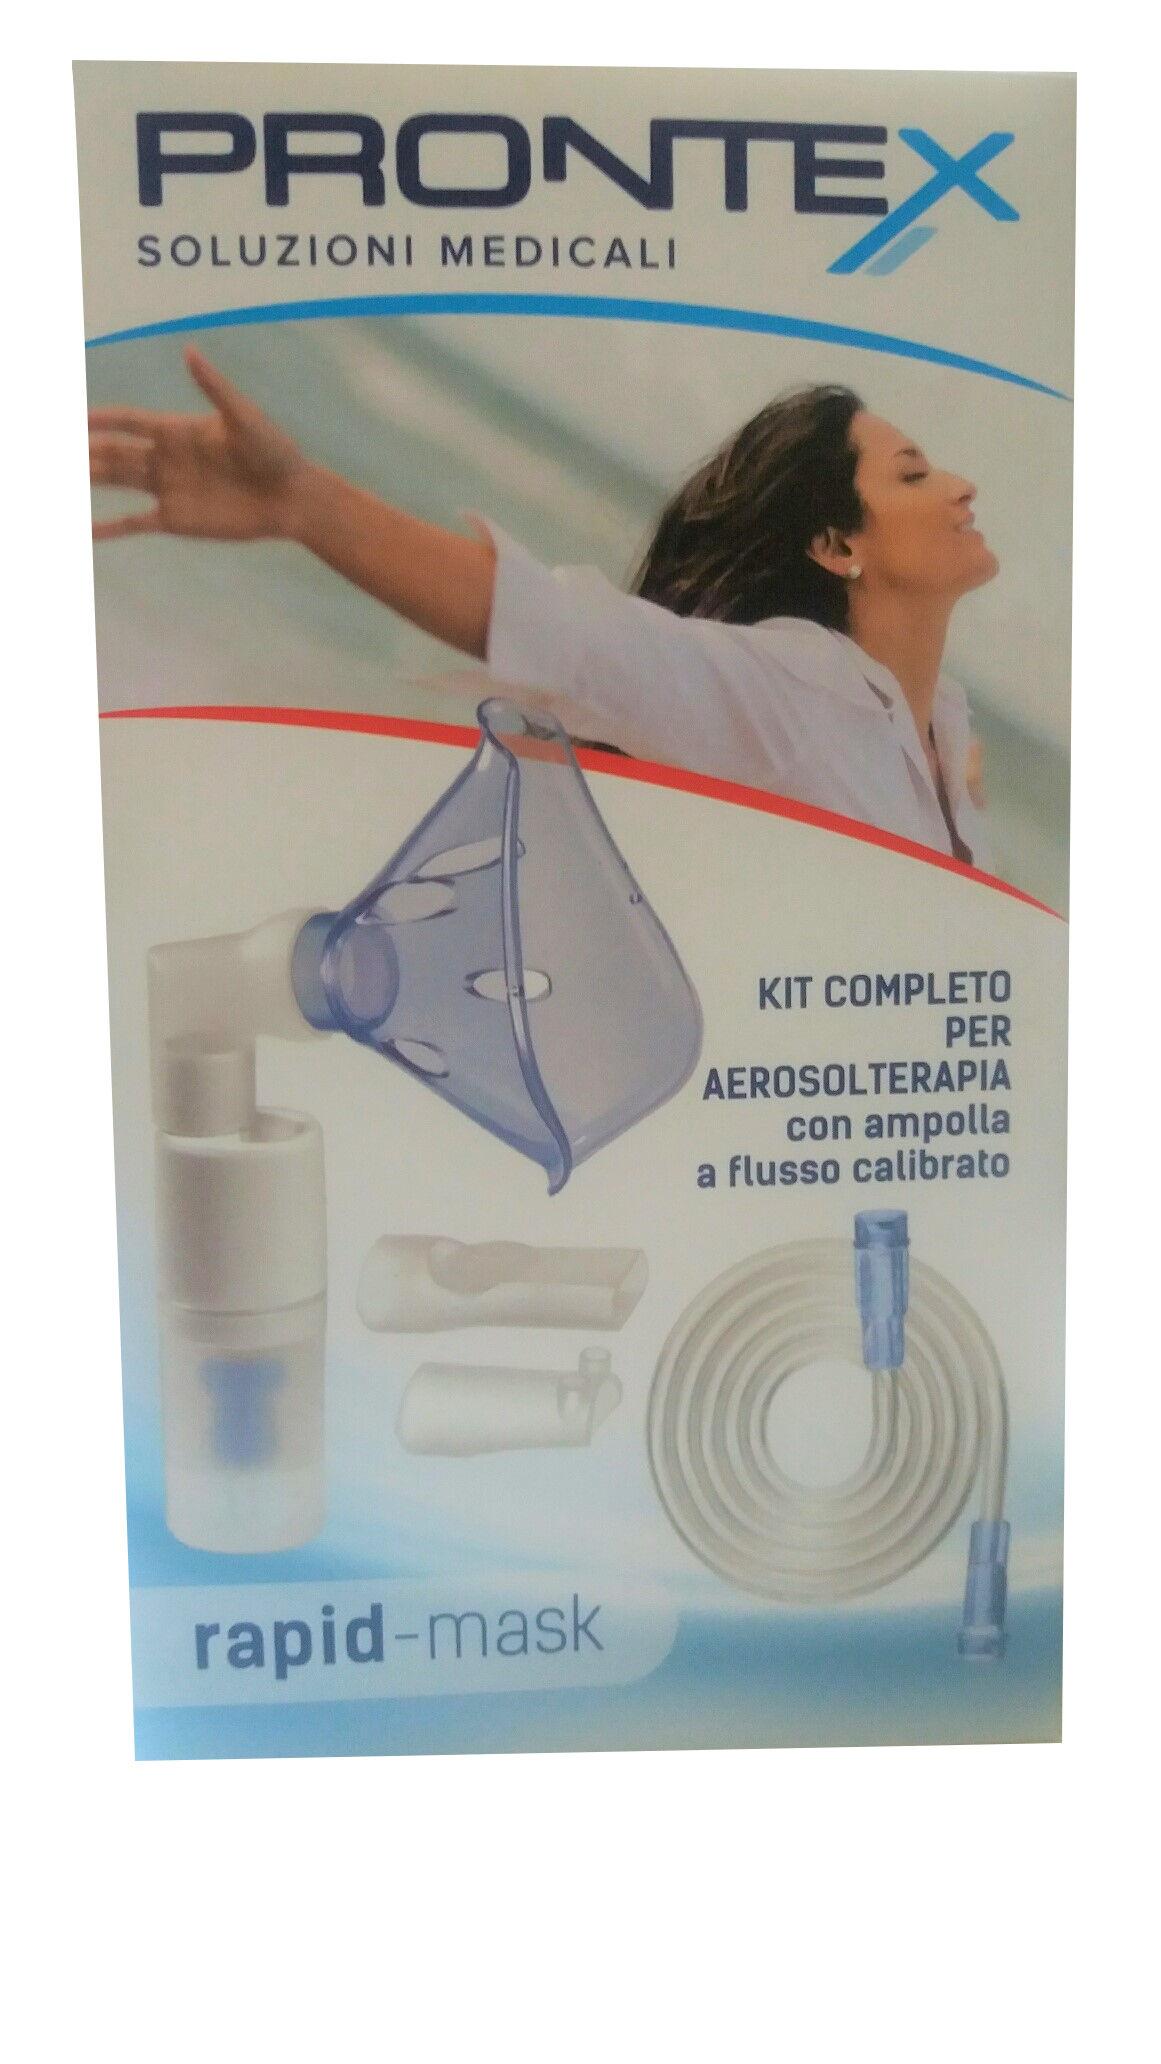 Safety Prontex Rapid mask Kit universale completo per aerosolterapia